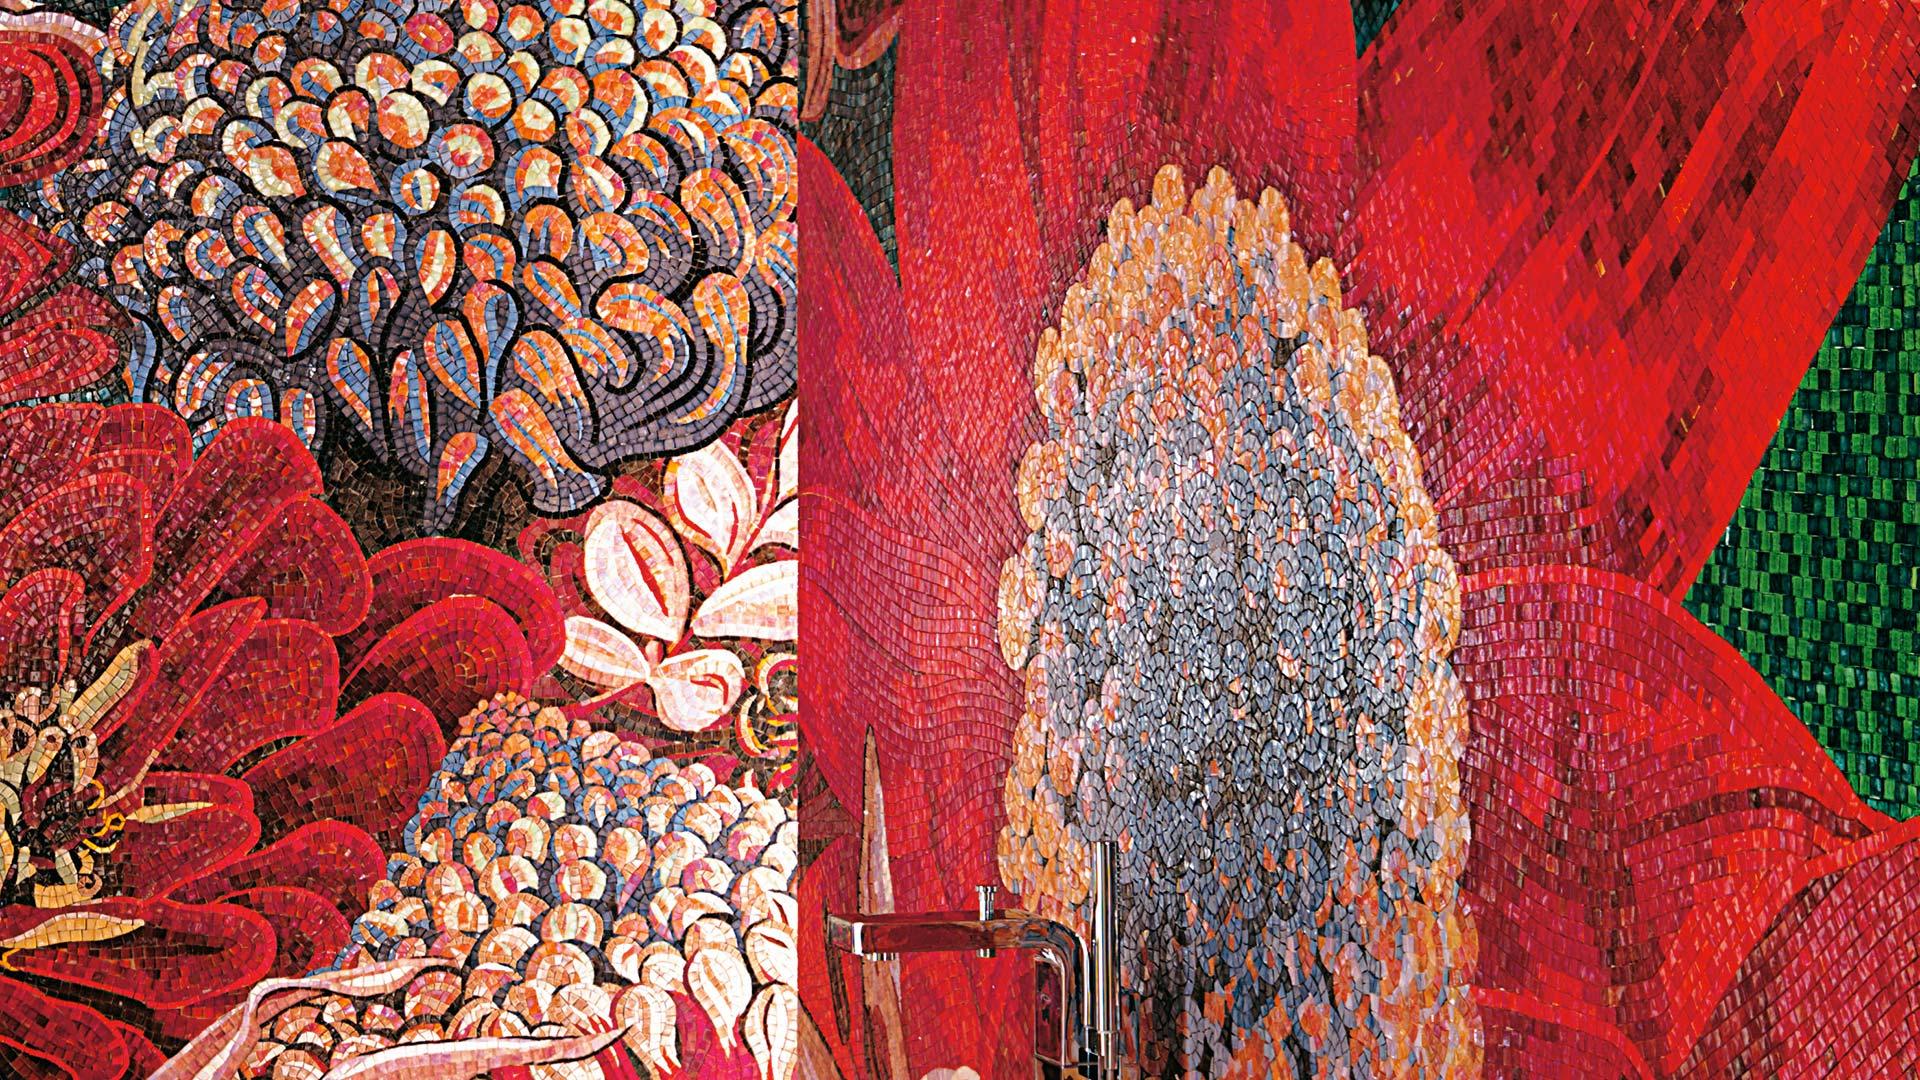 sicis mosaico flower power